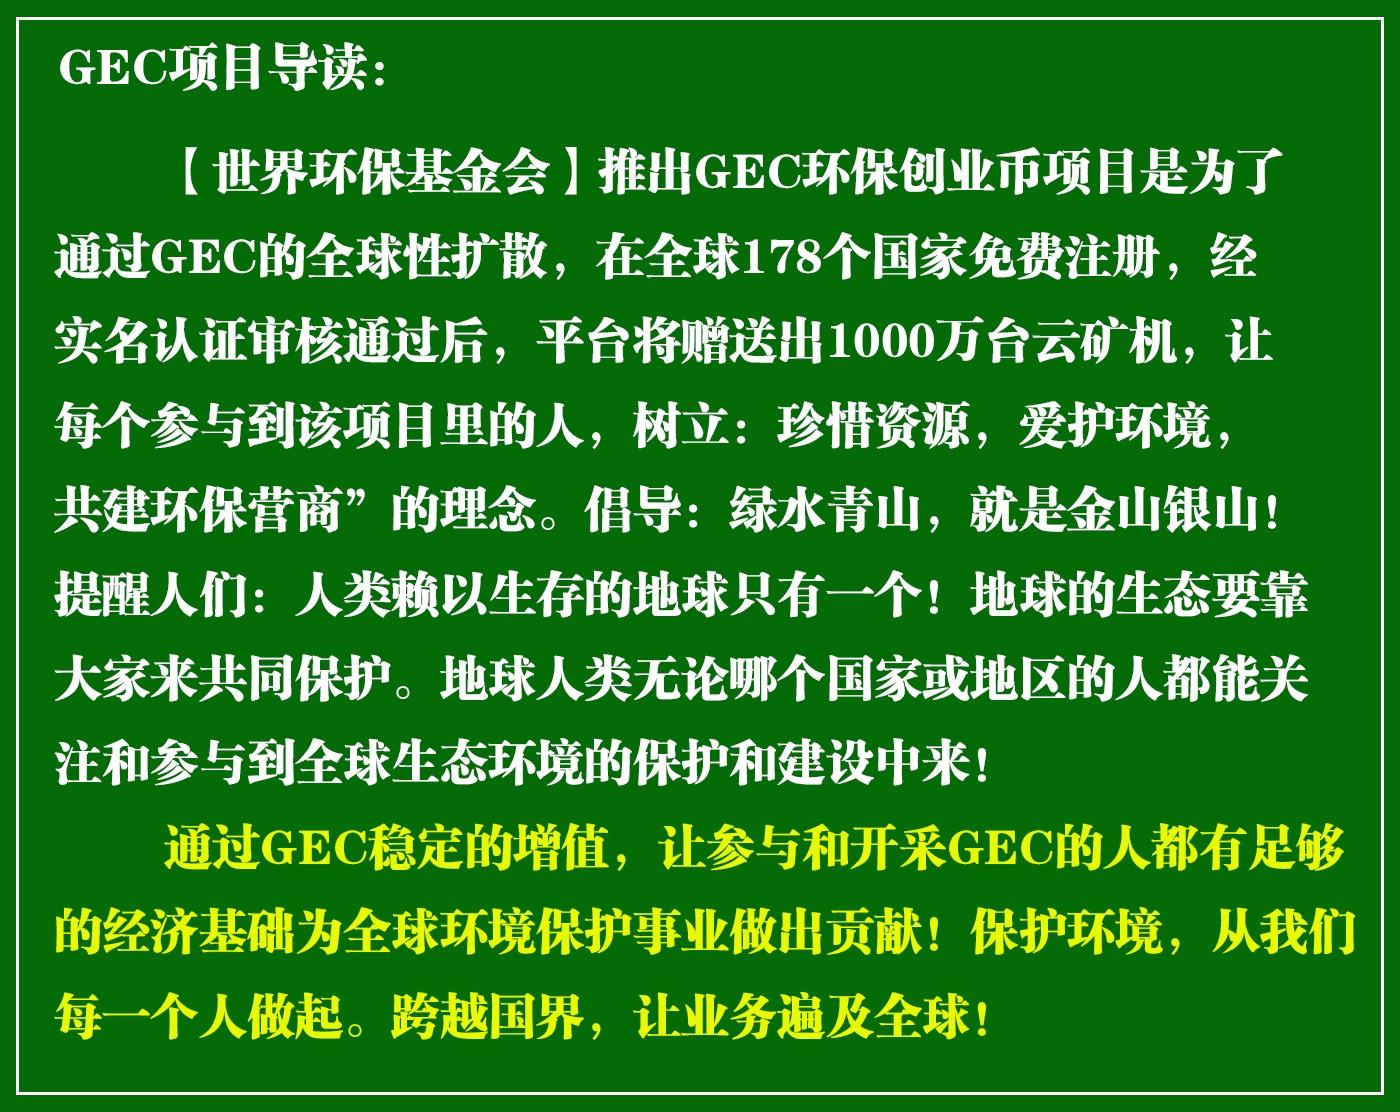 GEC项目导读.jpg